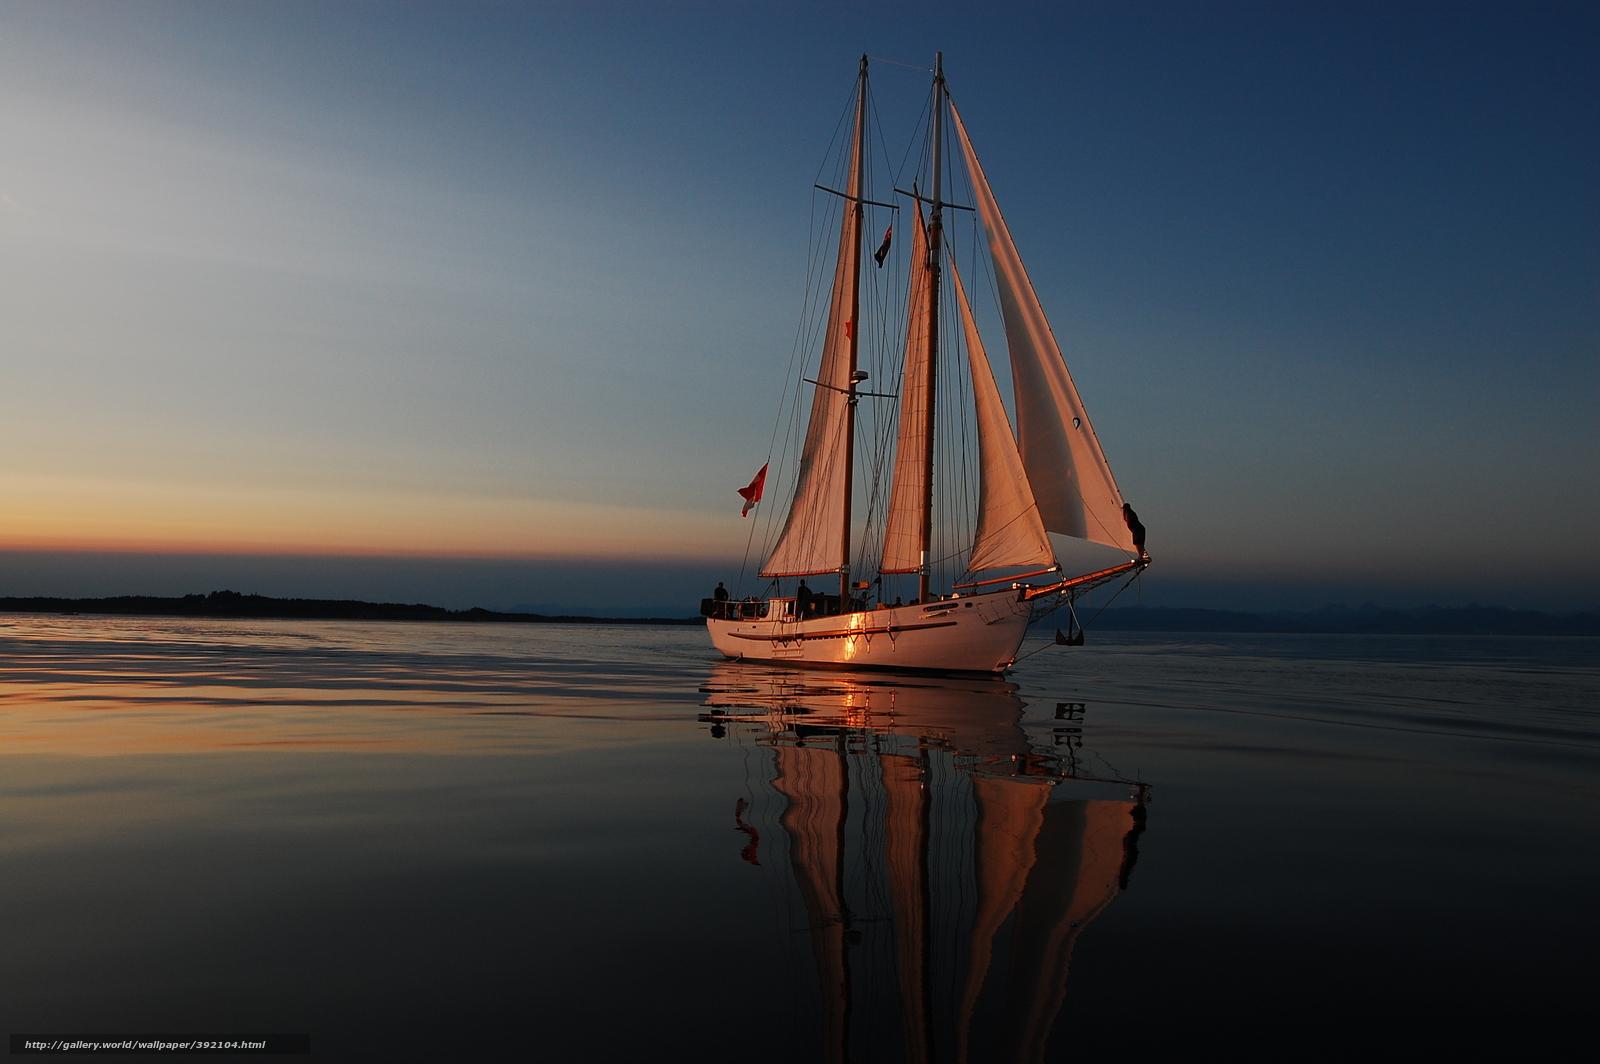 Заката паруса отдых путешествие